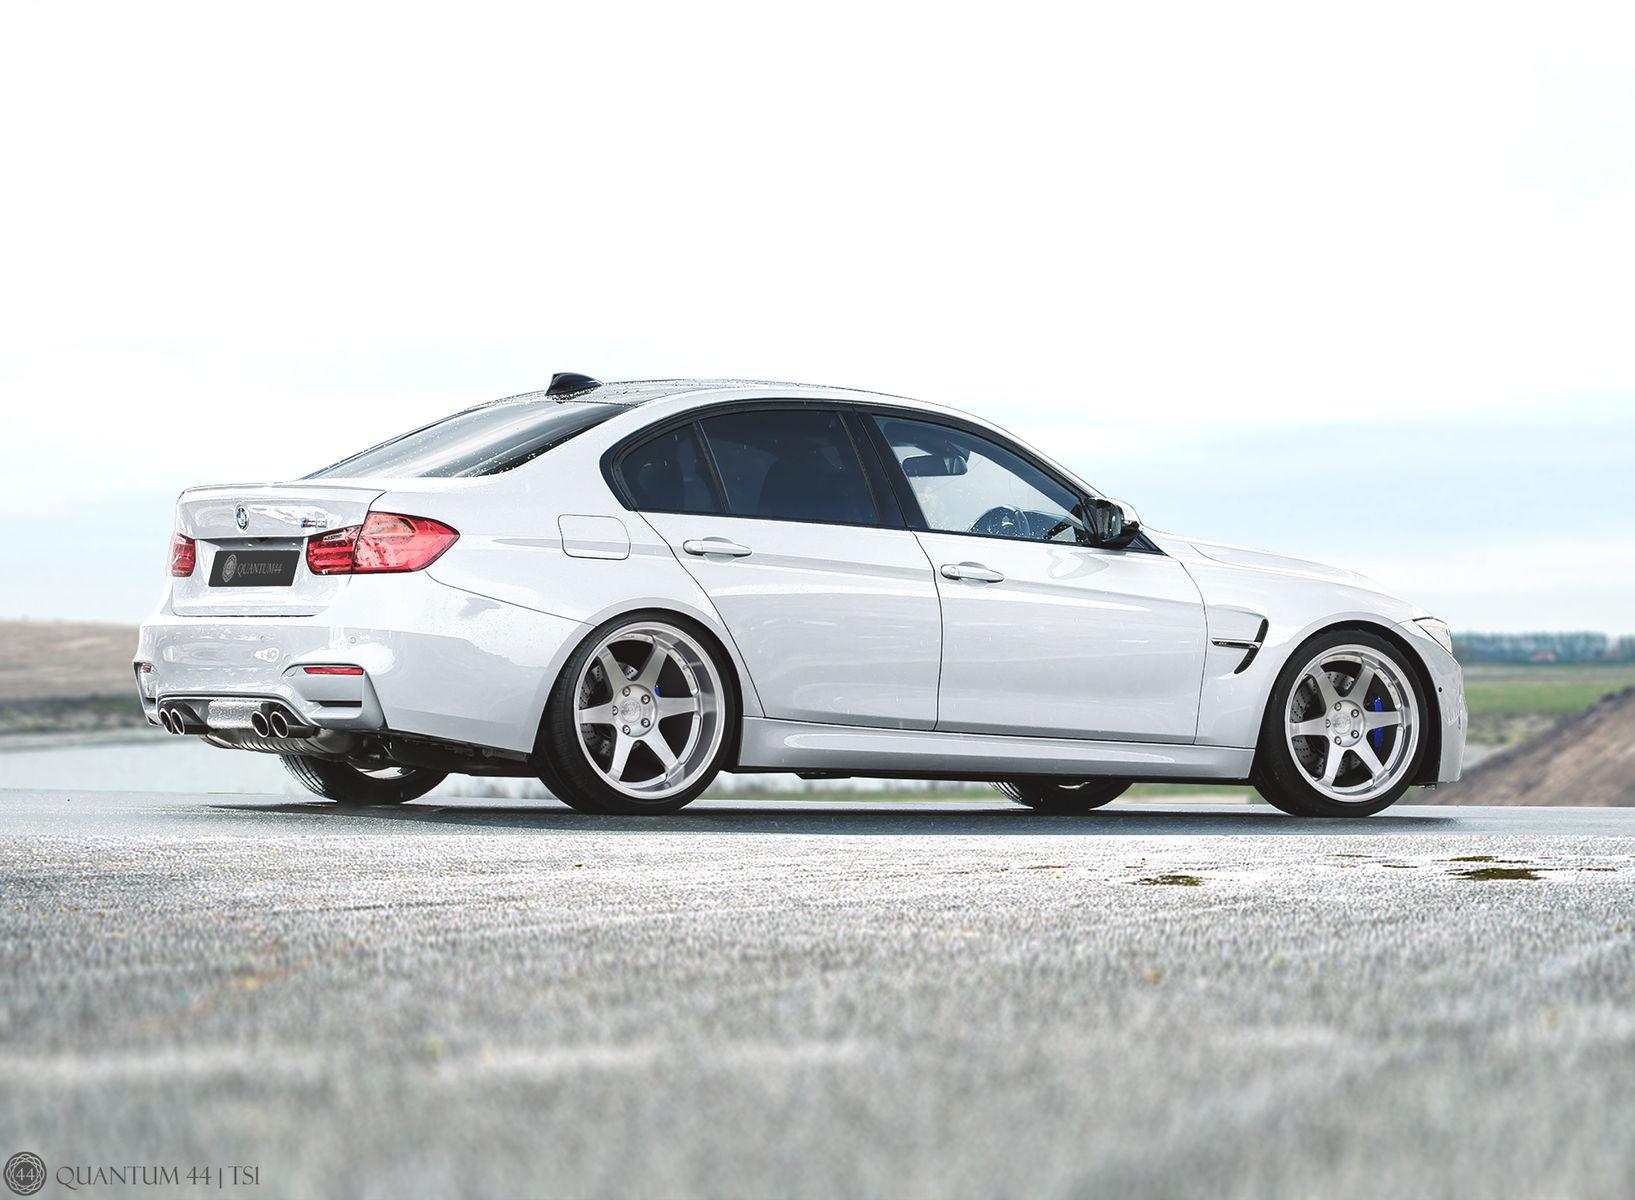 BMW M3 | Quantum44 TS1 - BMW M3